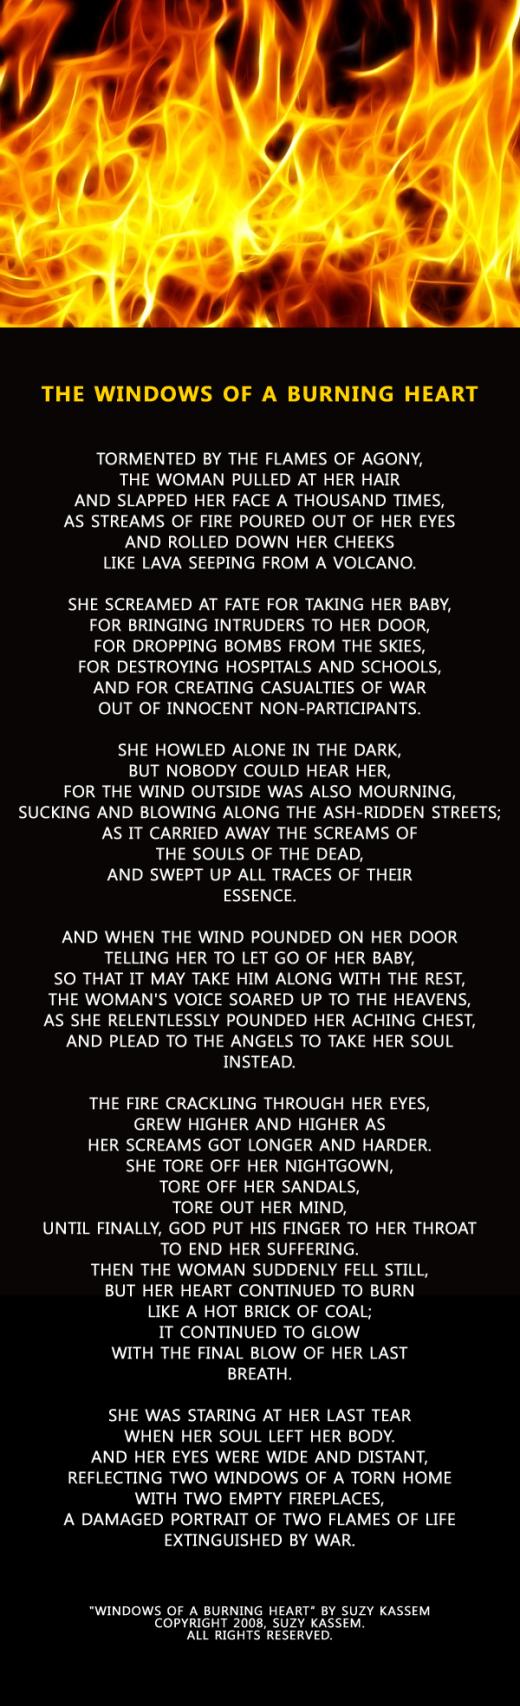 Suzy Kassem Poetry for War Mothers